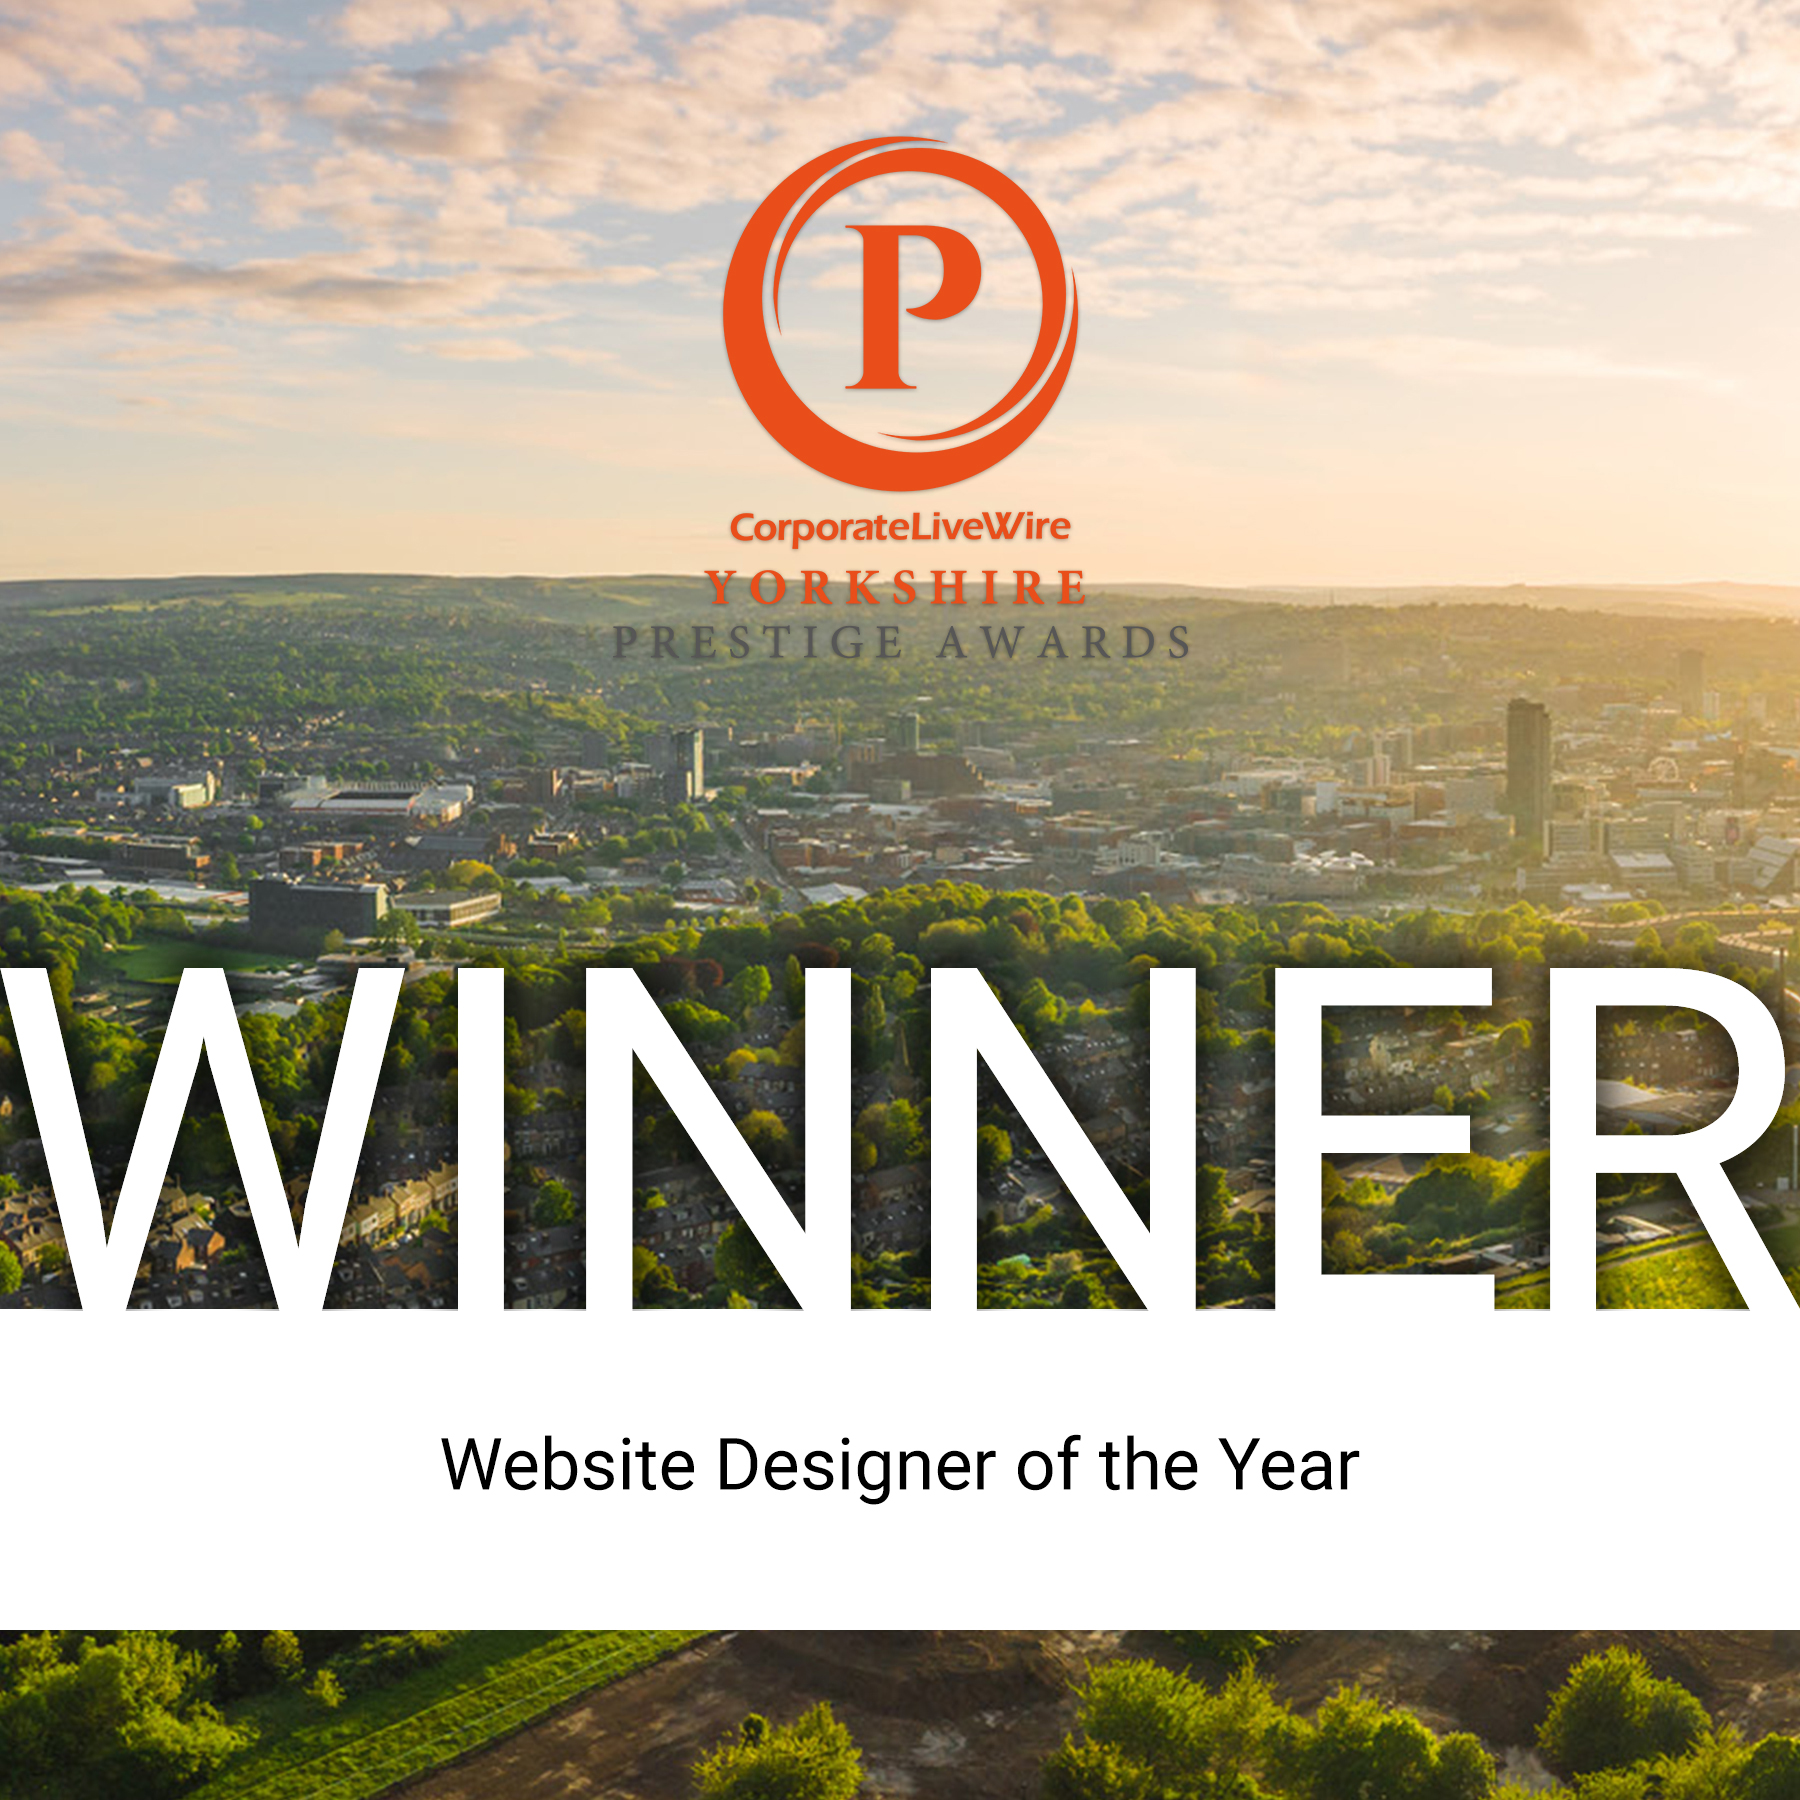 Website Designer of the Year